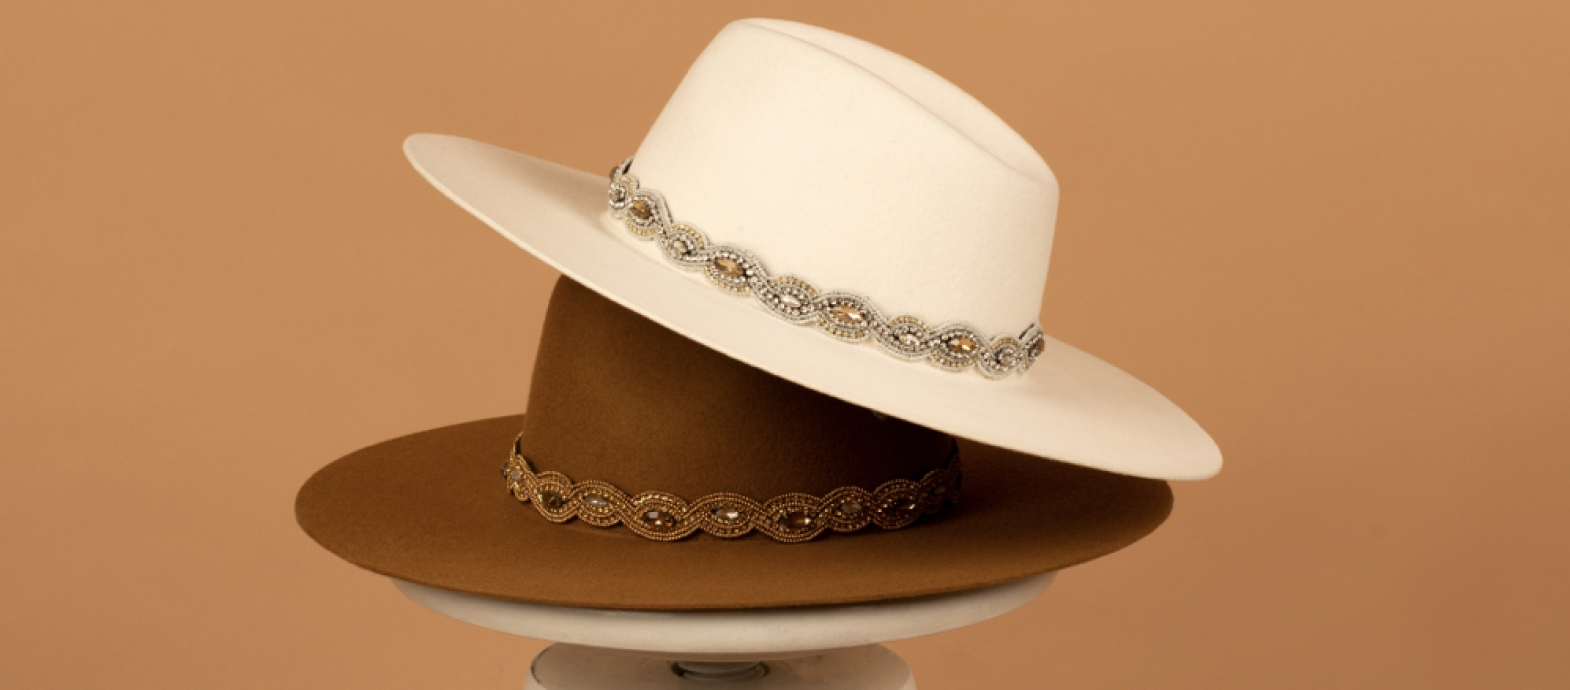 Bronté Amina vilt fedora hoed met keuze uit strass decoratie of suède riempje of puur